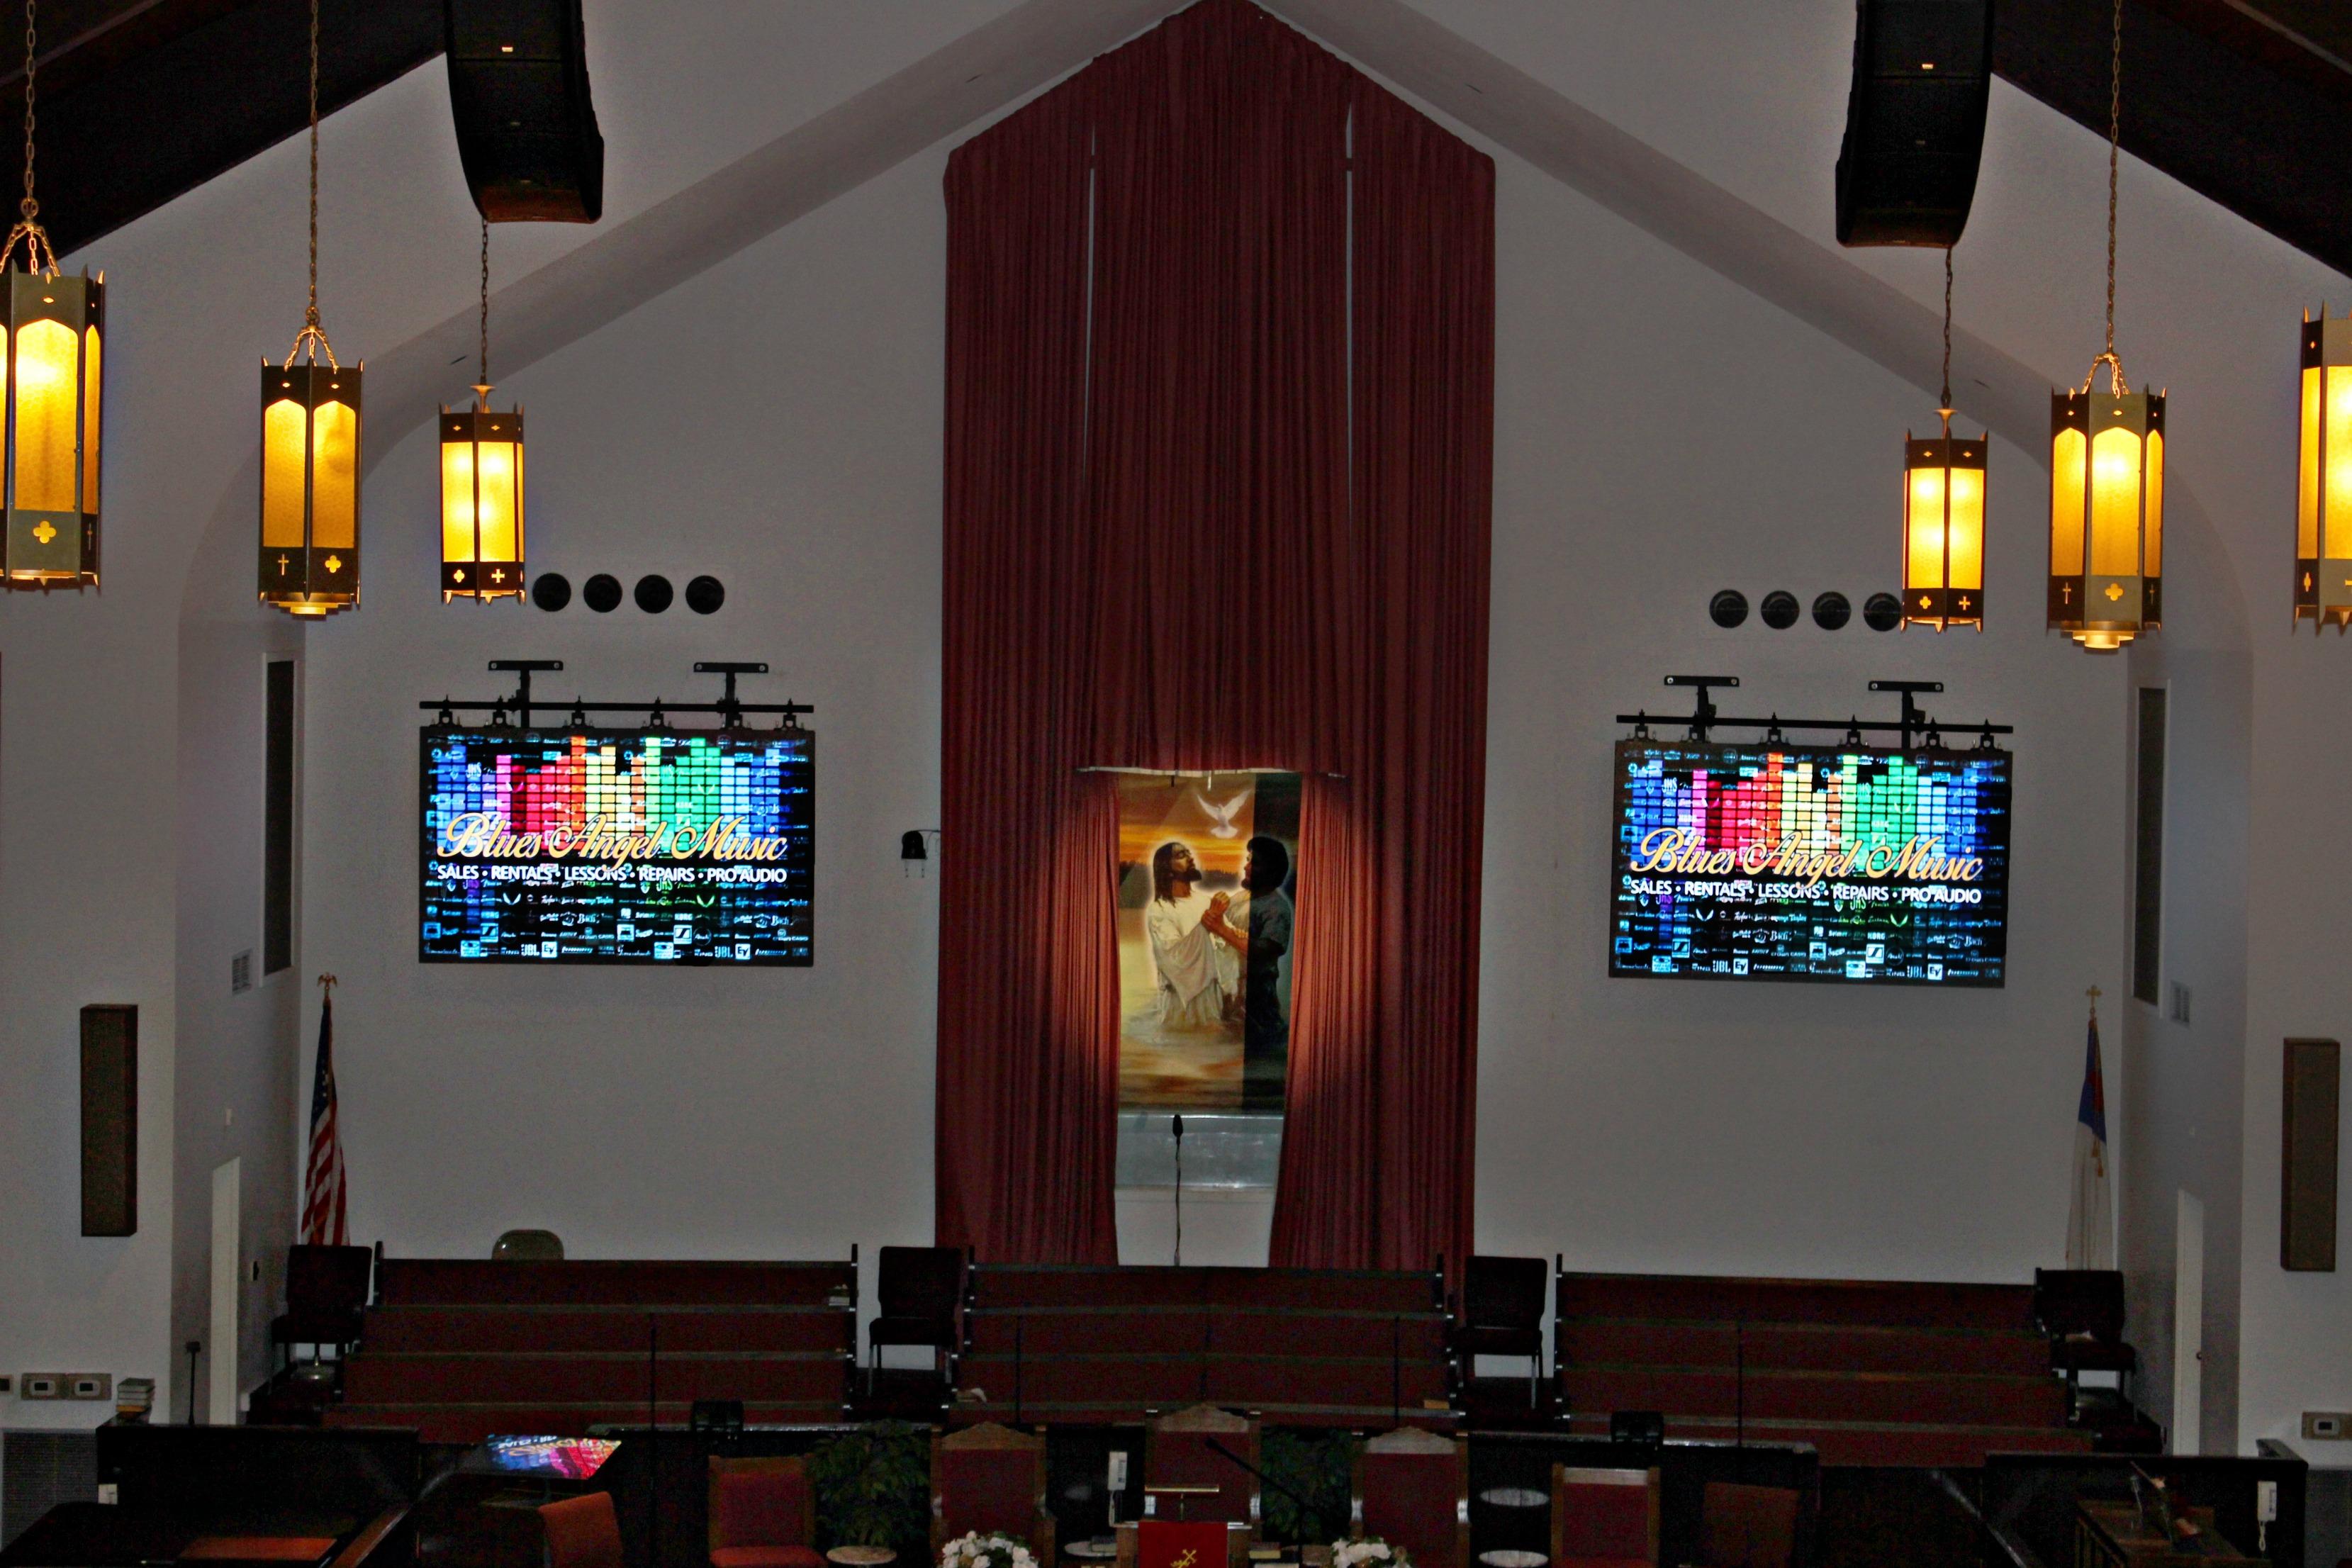 Greater Union Baptist Church